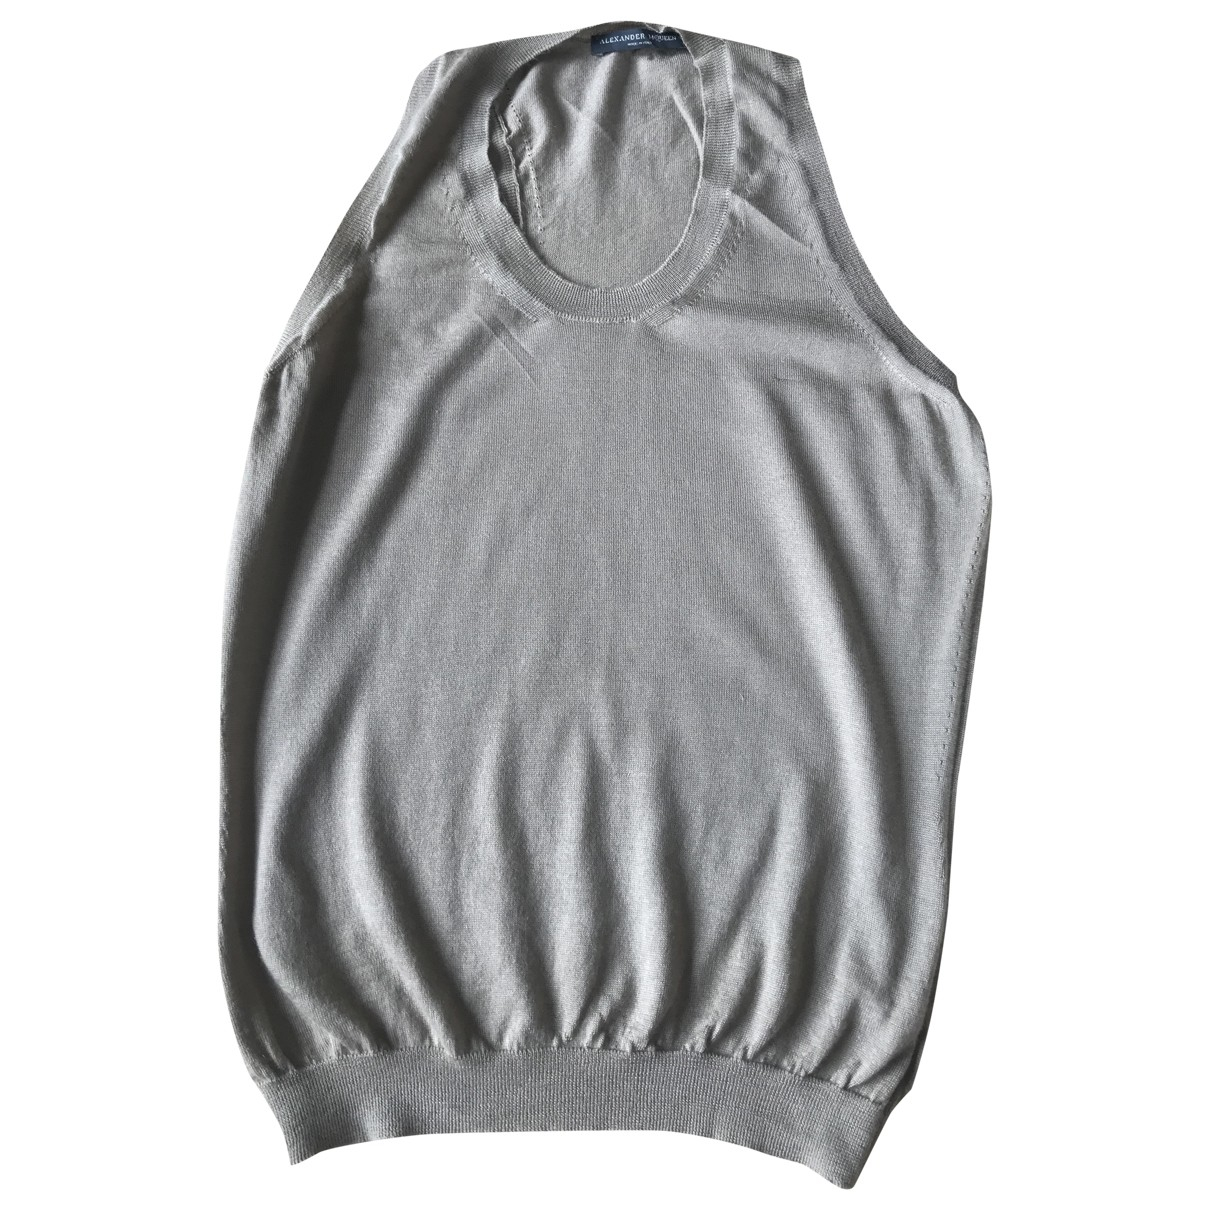 Camiseta sin mangas de Cachemira Alexander Mcqueen